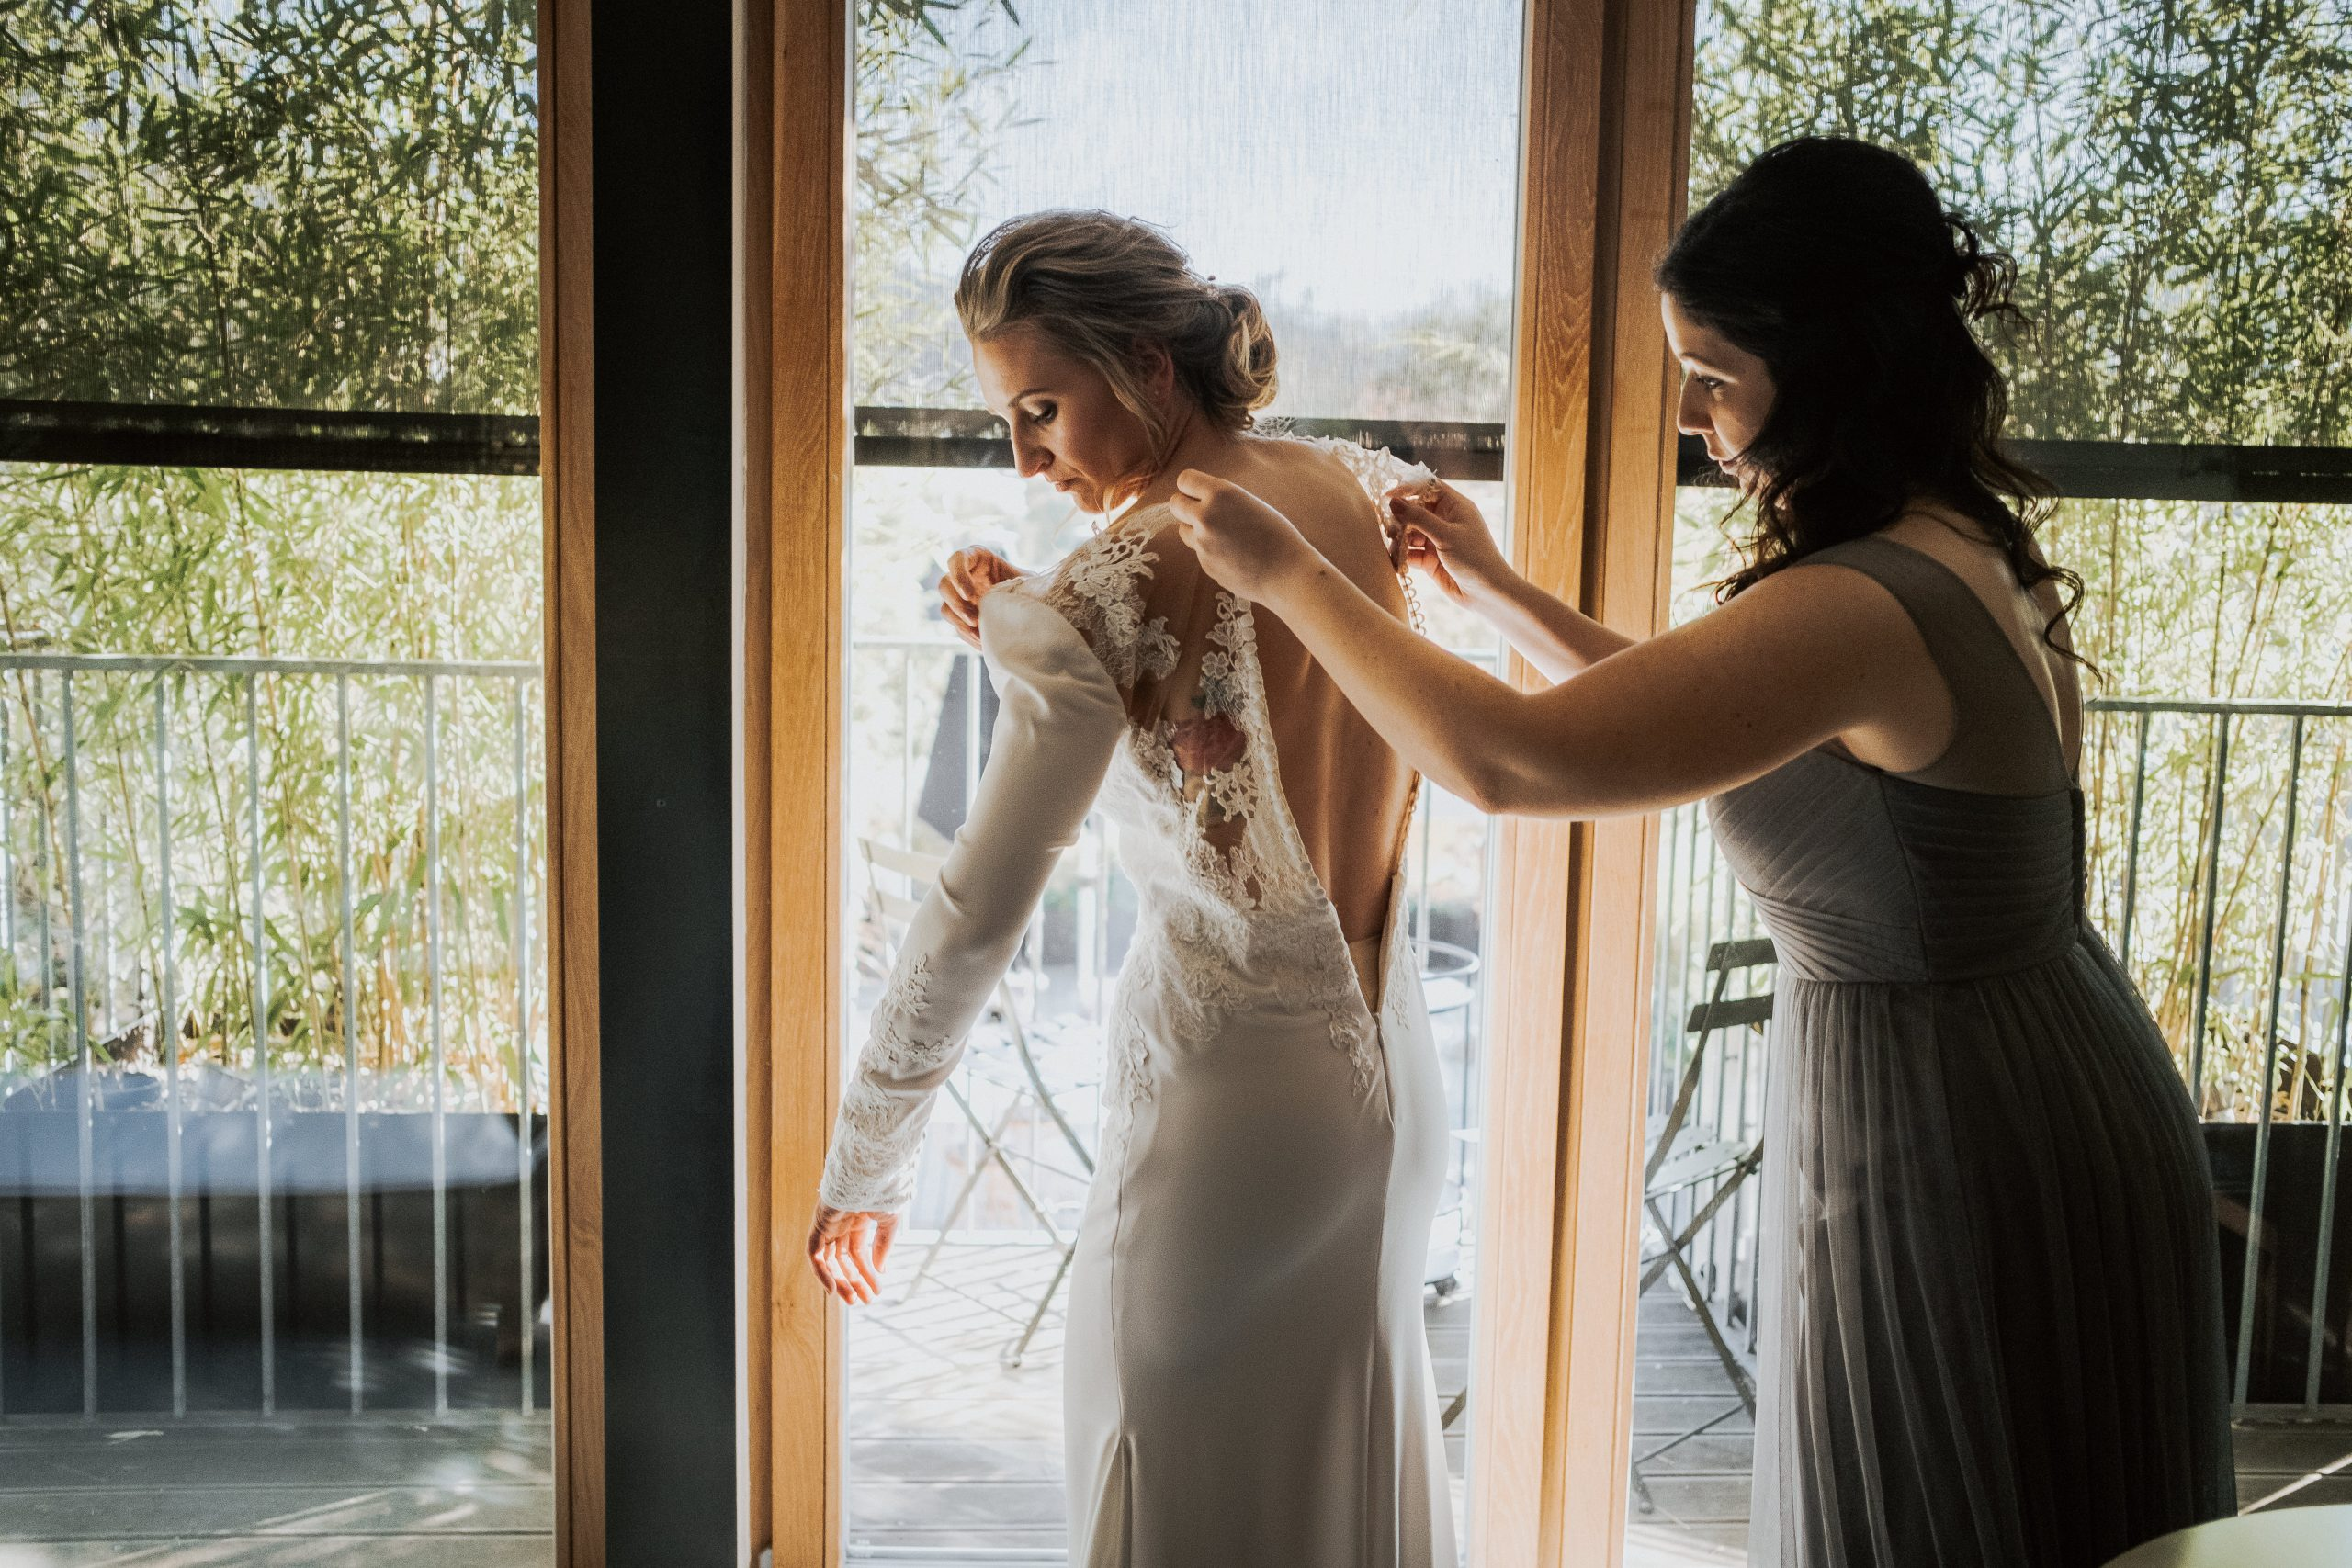 Blitzkneisser-Photo-Mountain-Wedding-Tyrol-86